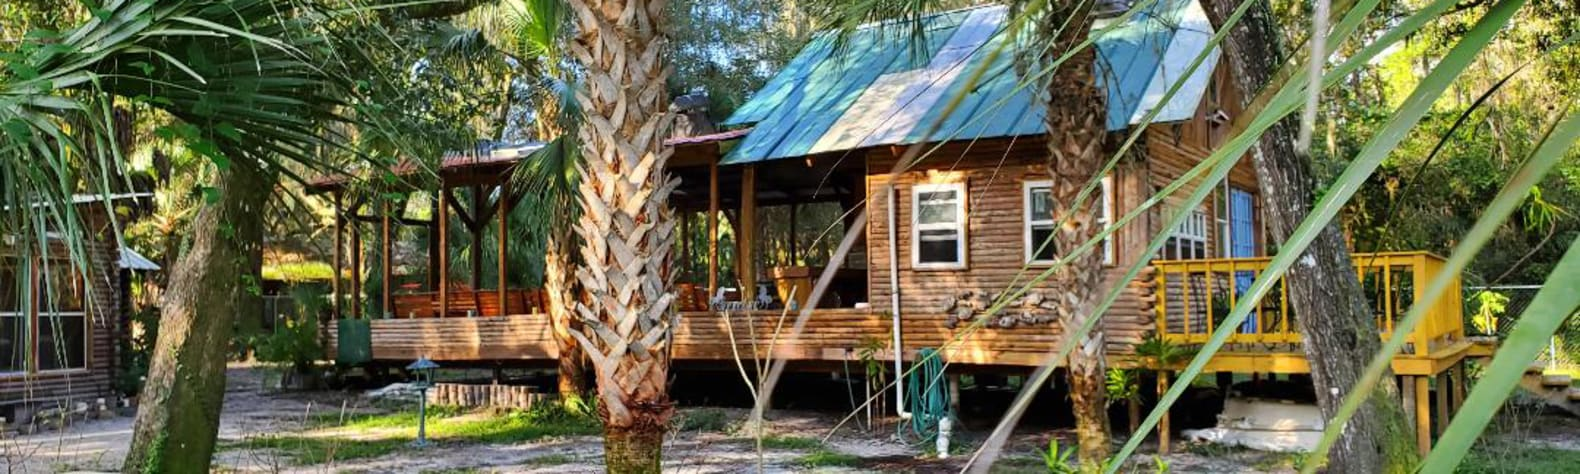 The Love Lodge